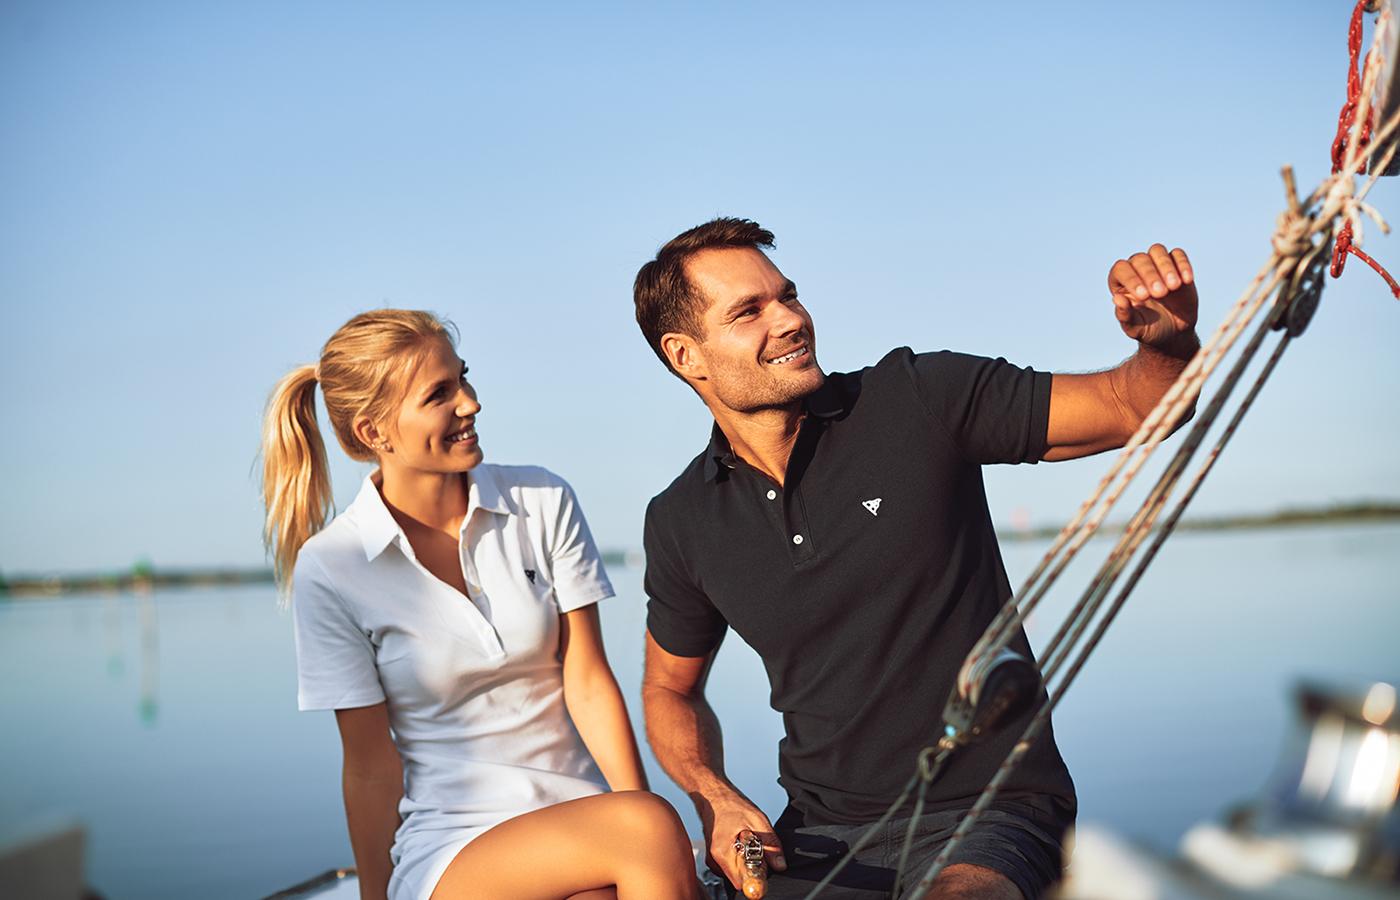 Seasonsail evening couple sailing polo